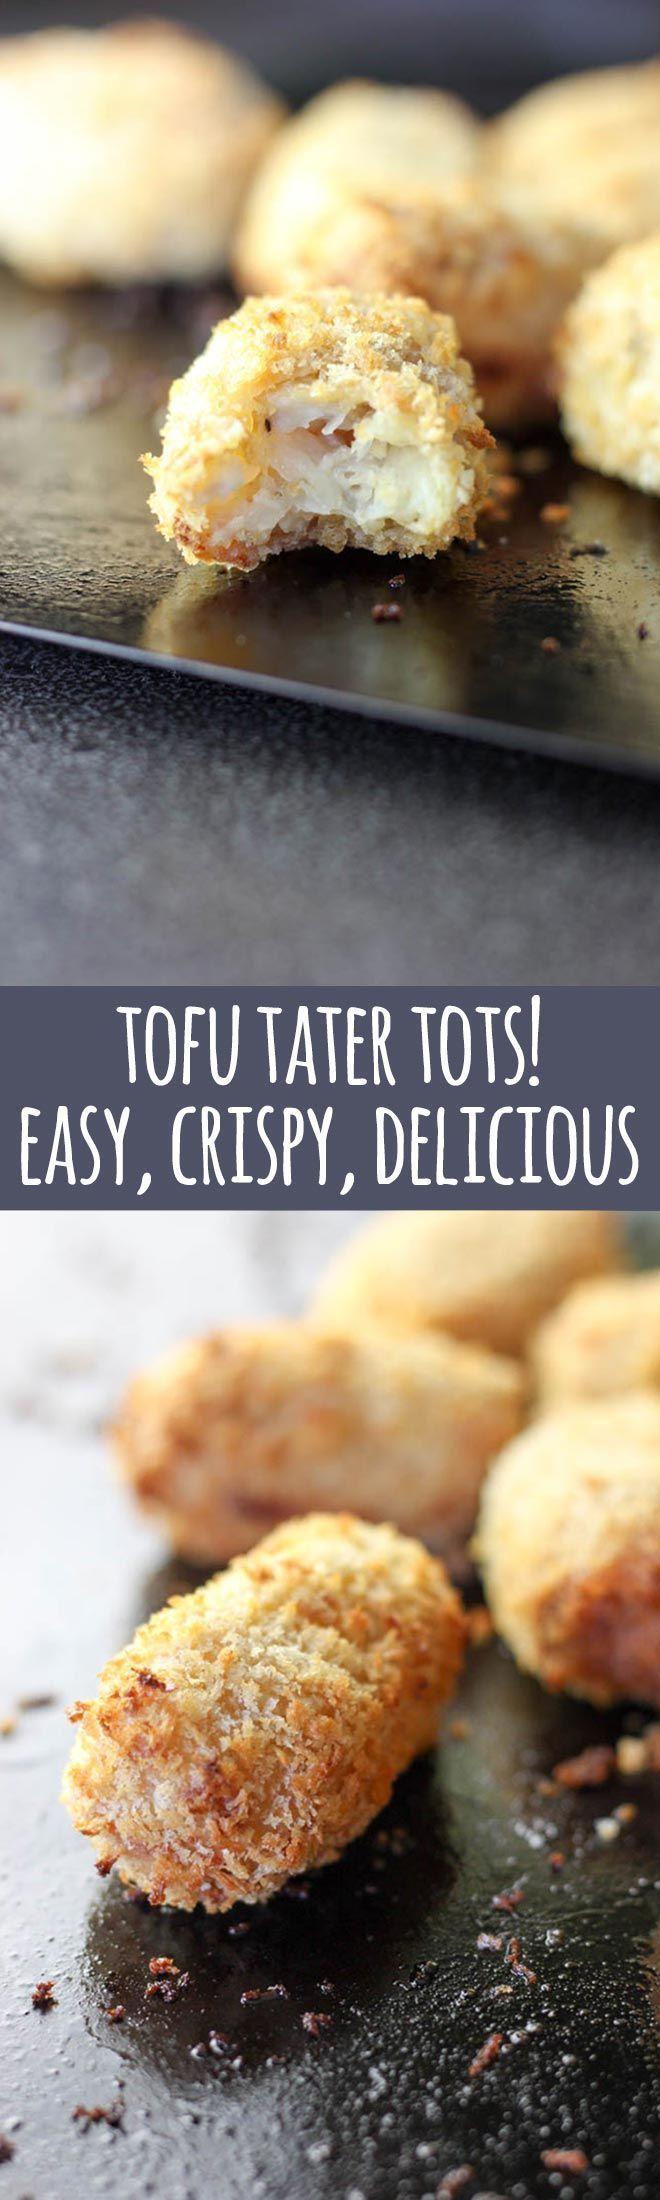 W & O: Crispy tofu tater tots